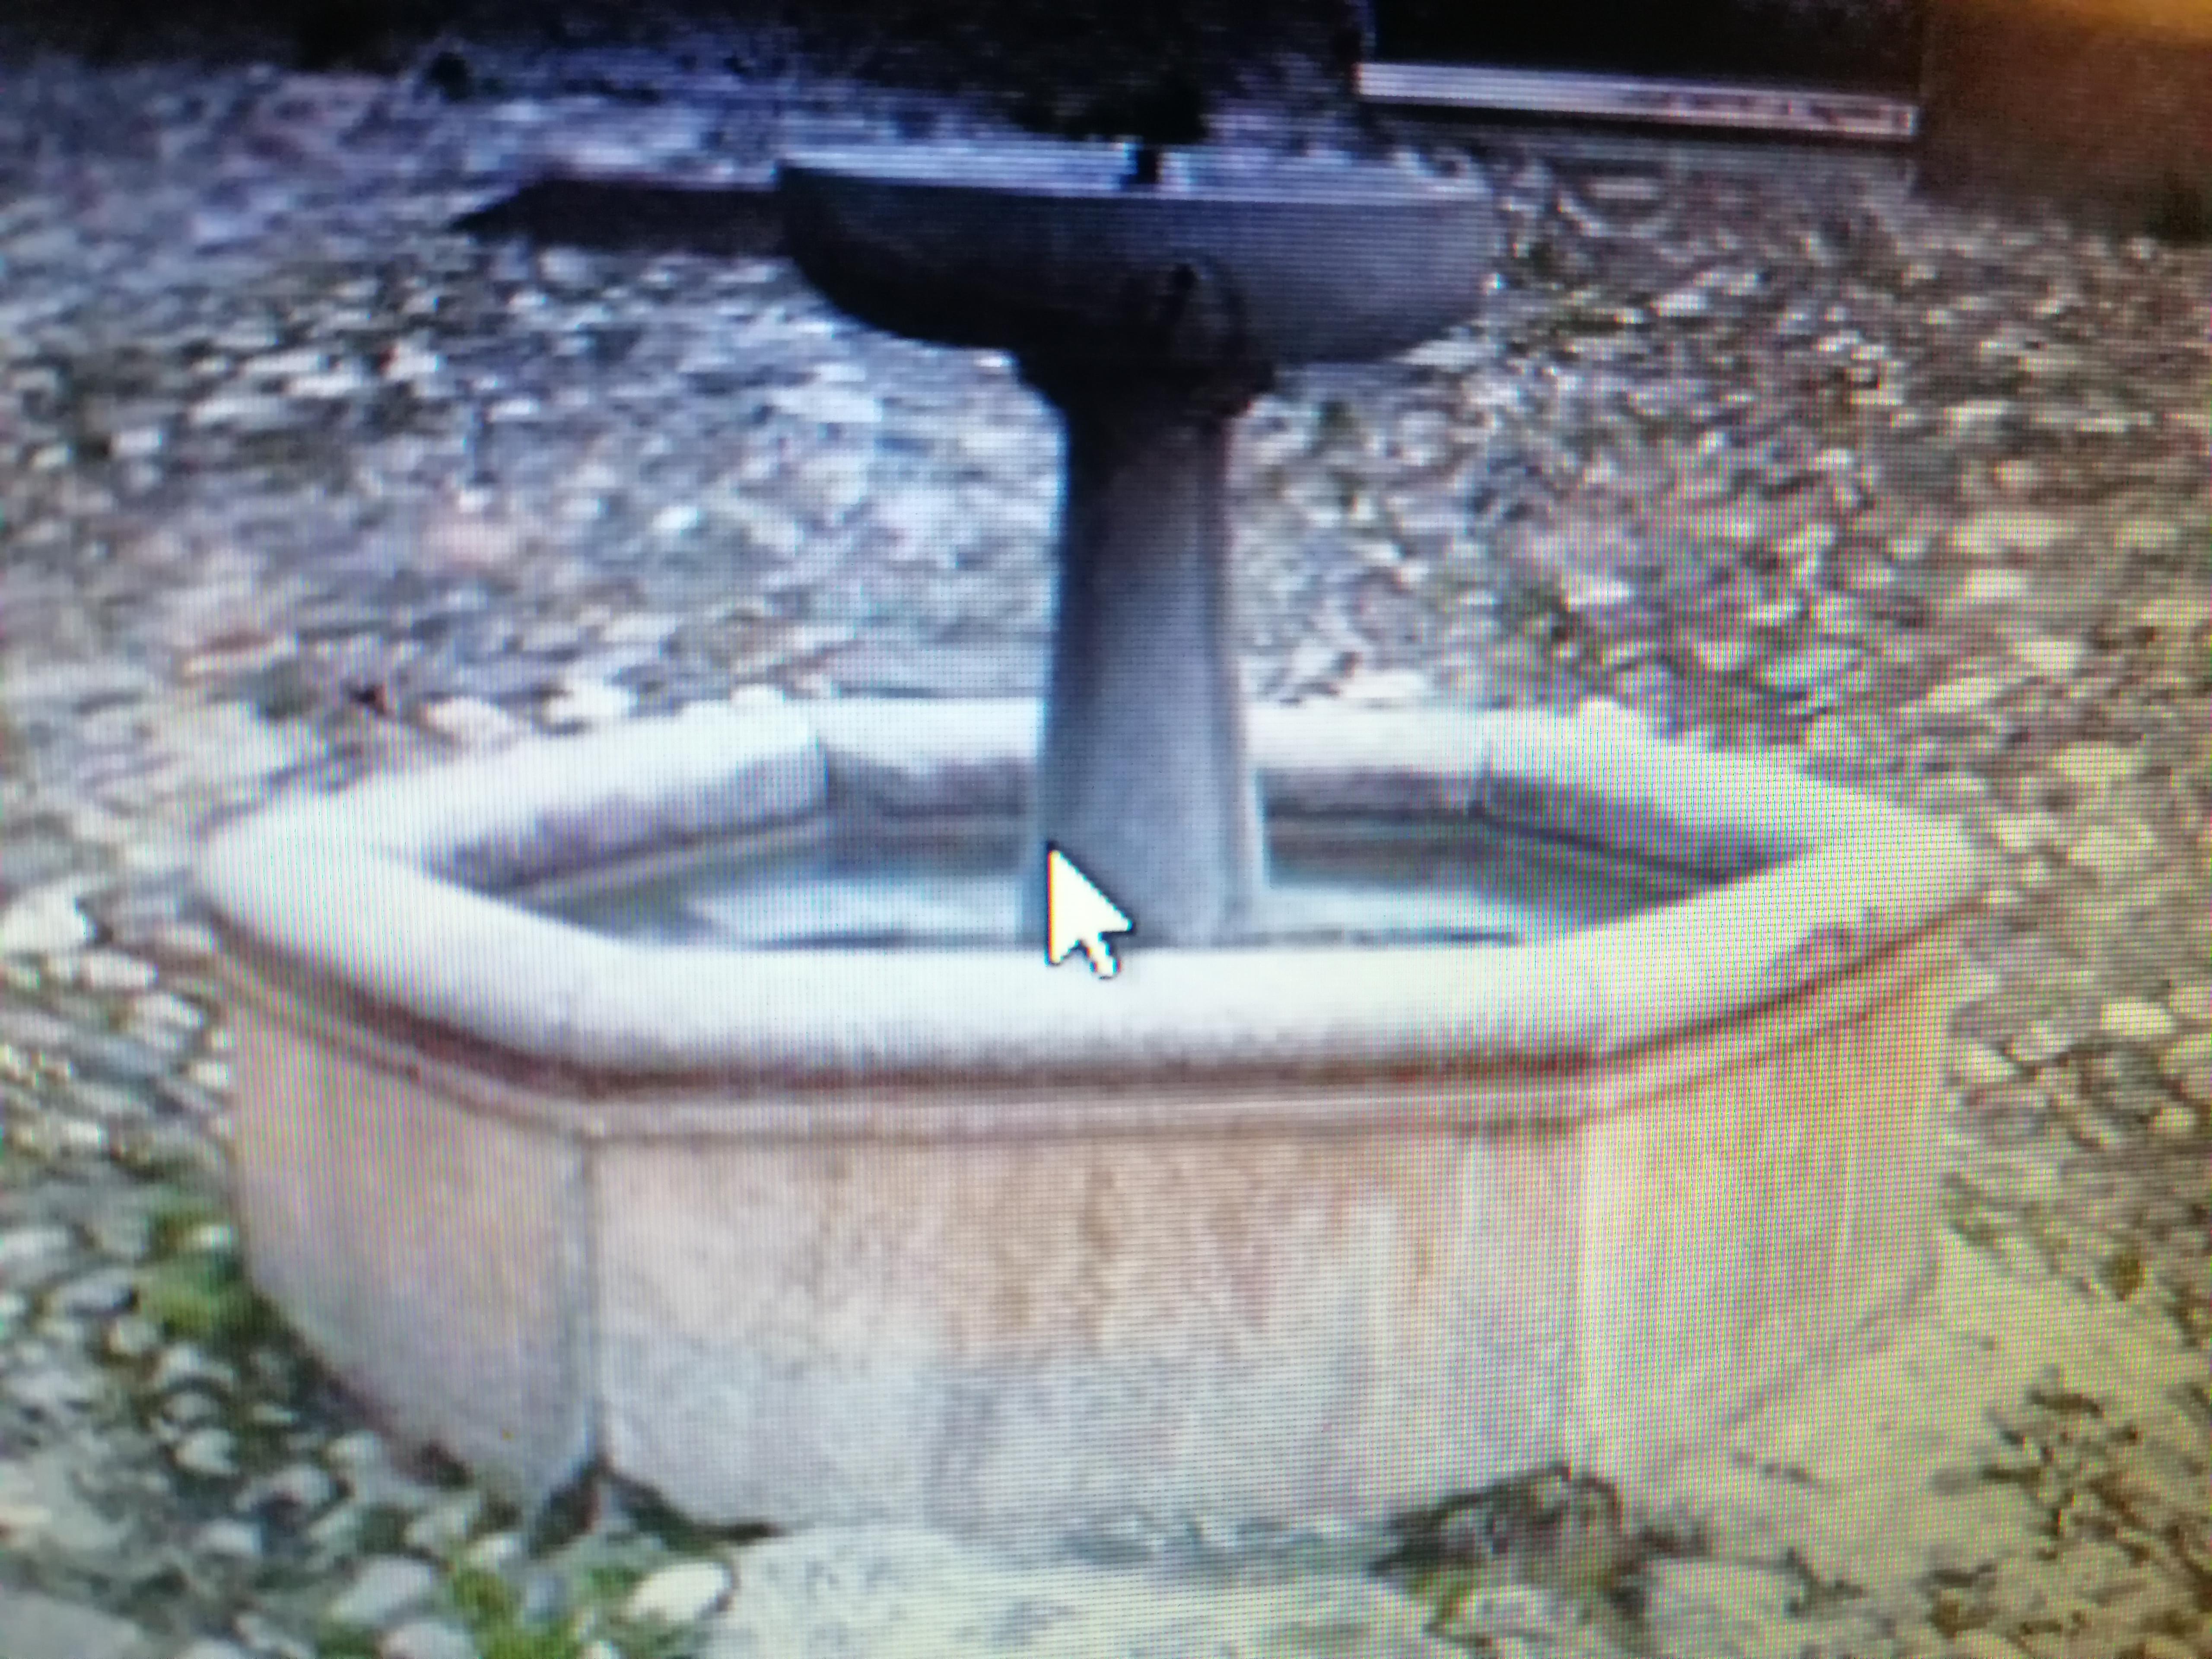 Fuente Placeta del Cobertizo